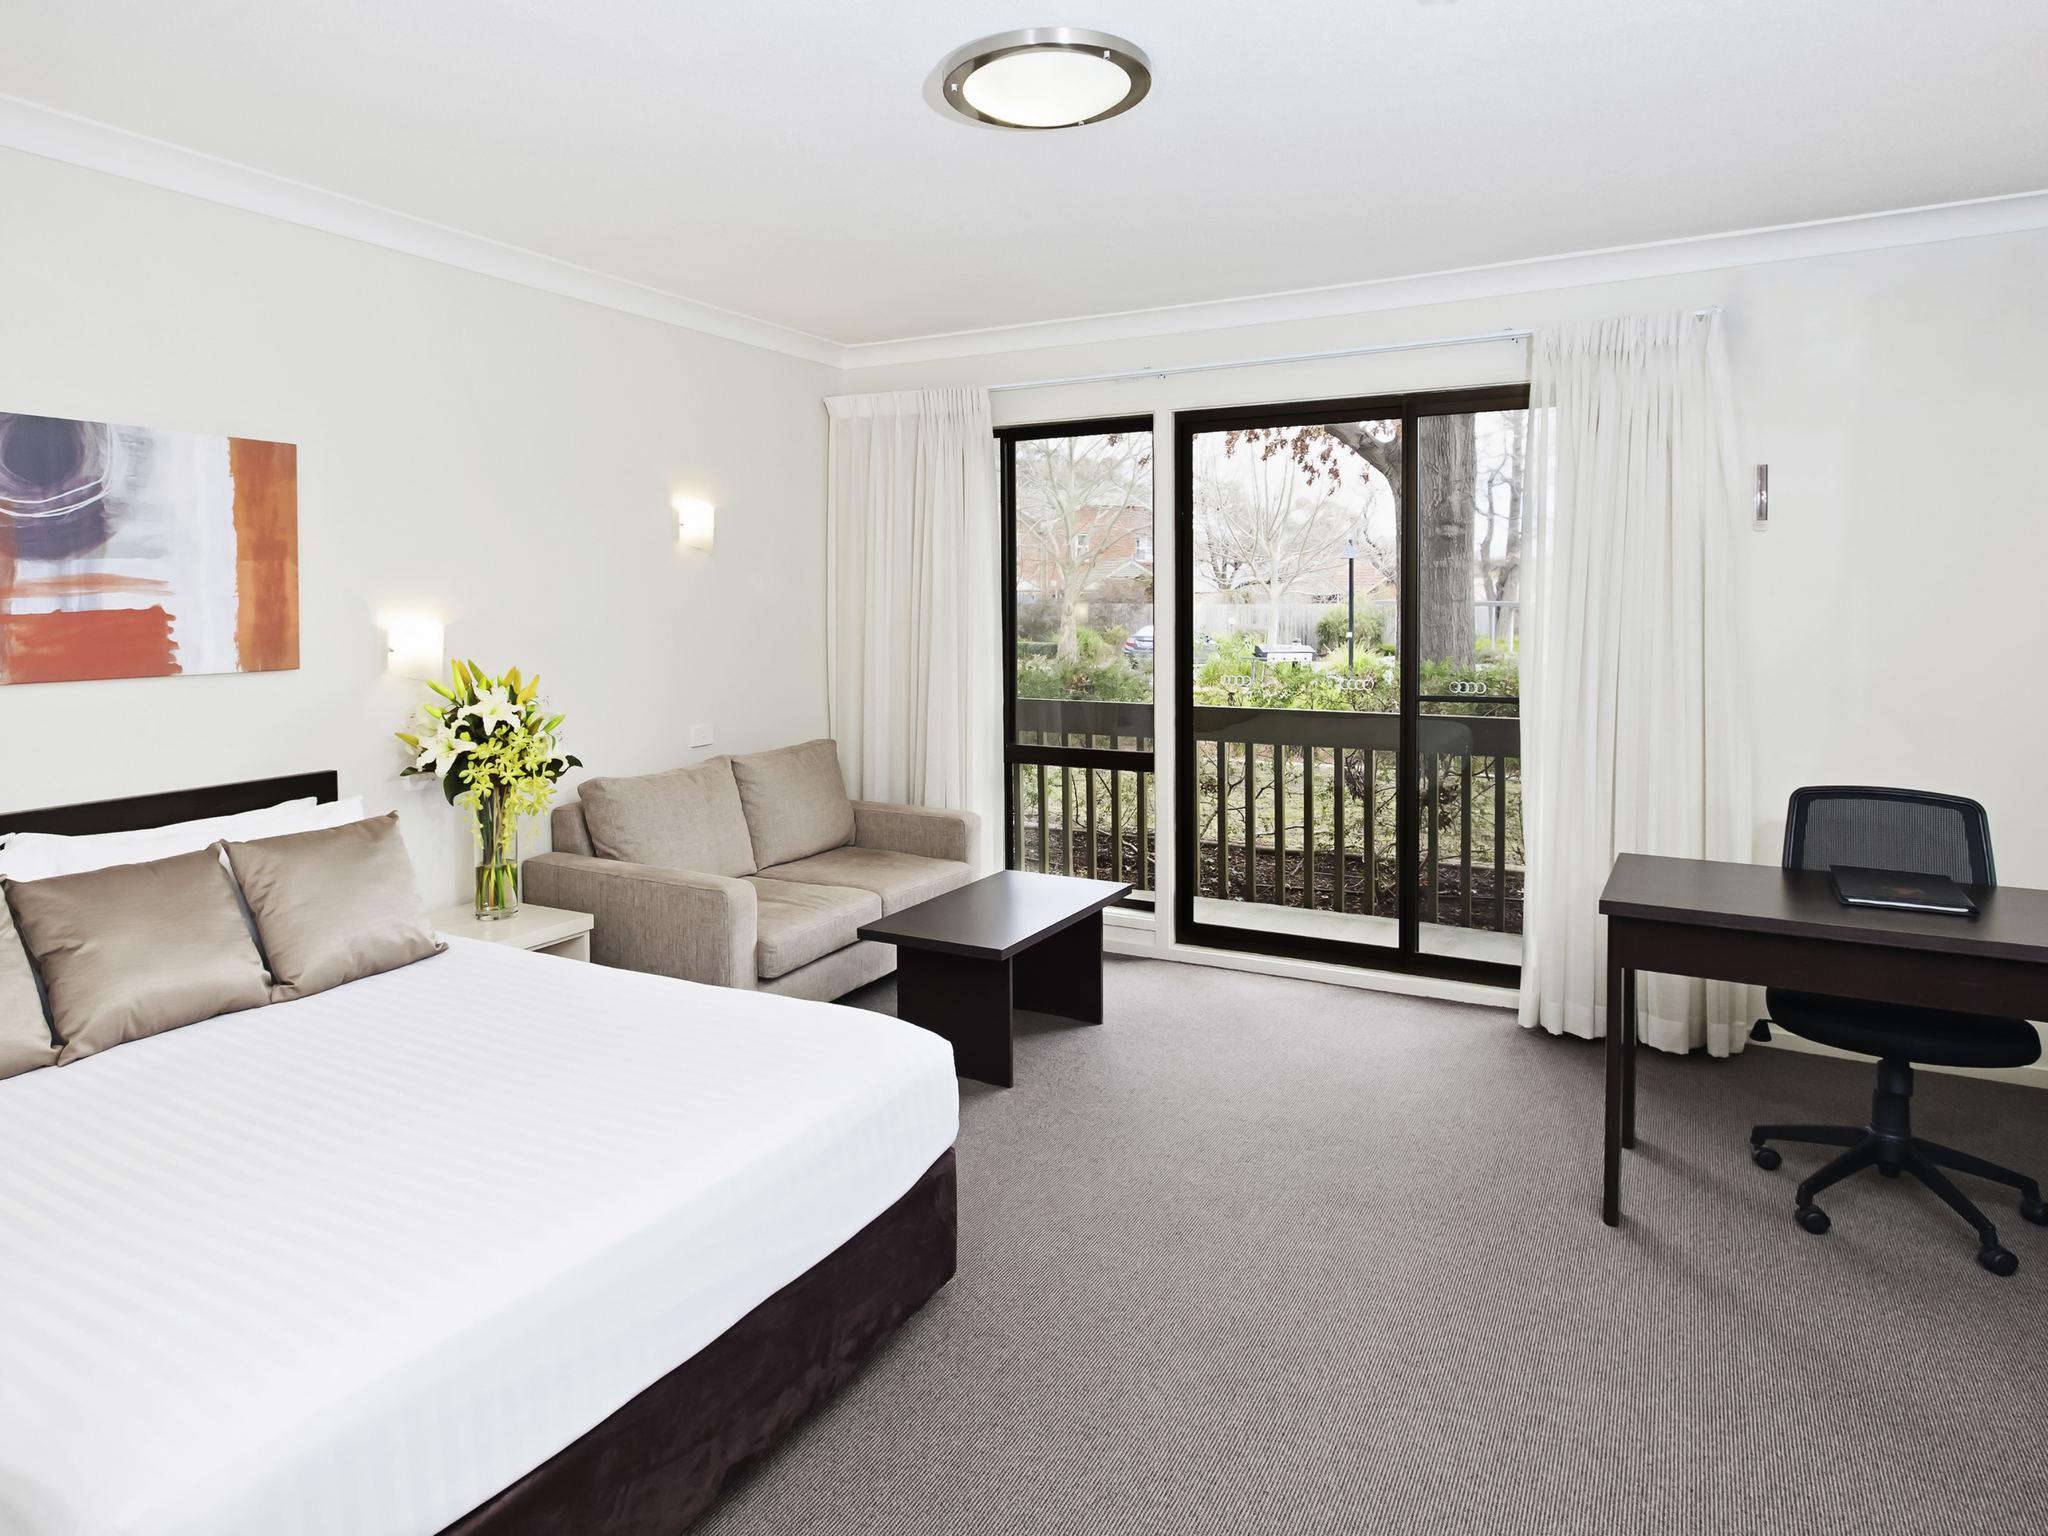 Hôtel - Tall Trees Canberra